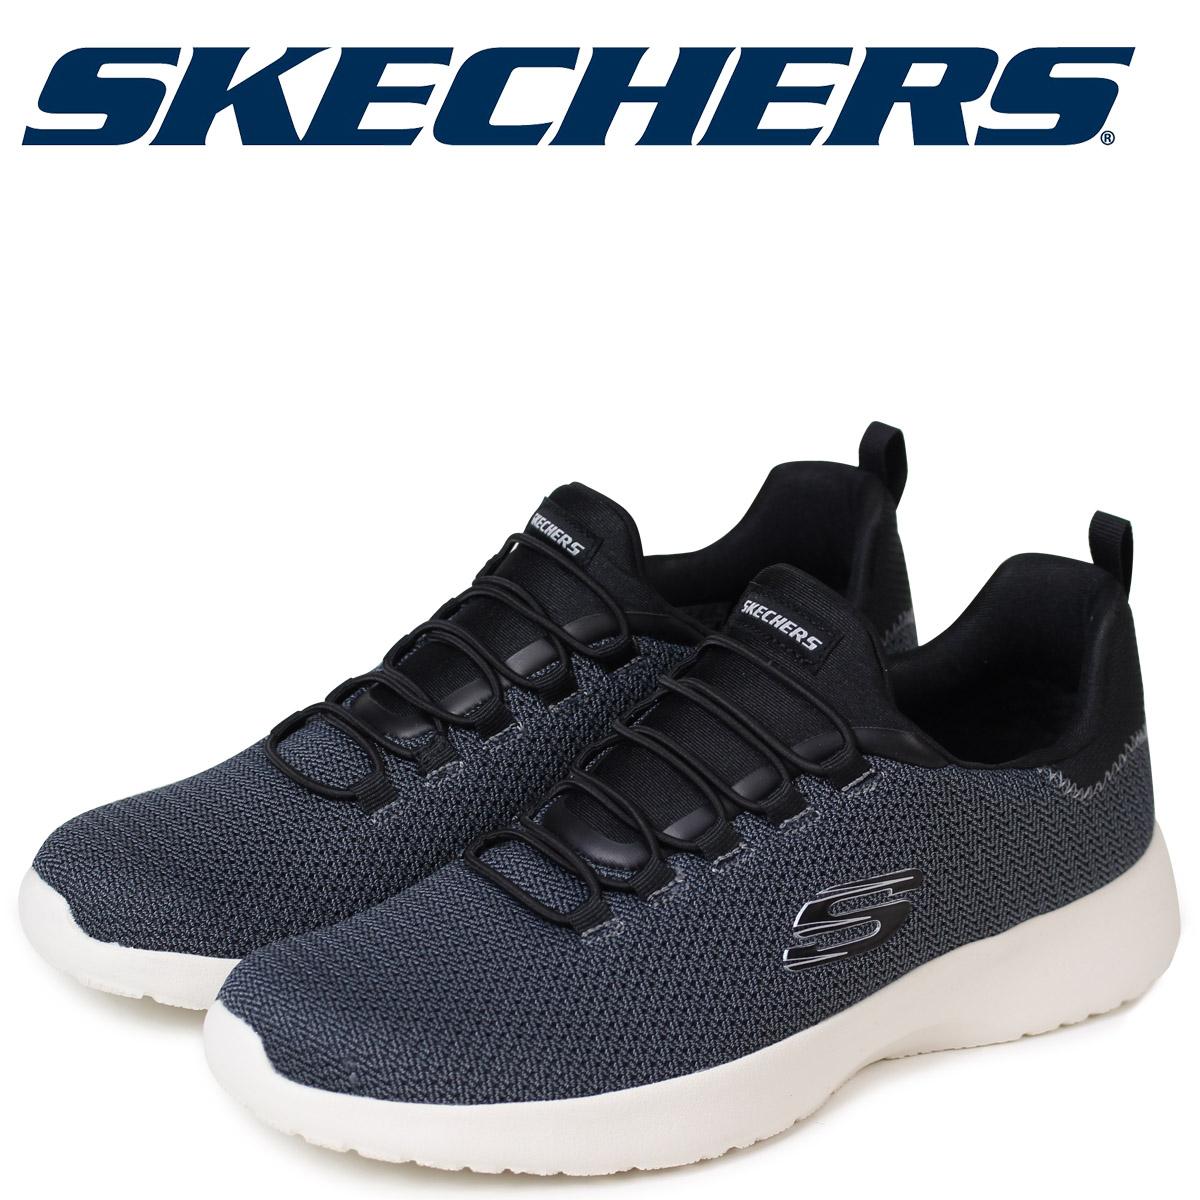 chaussures shop LEAD   Rakuten Global Market: スケッチャーズ